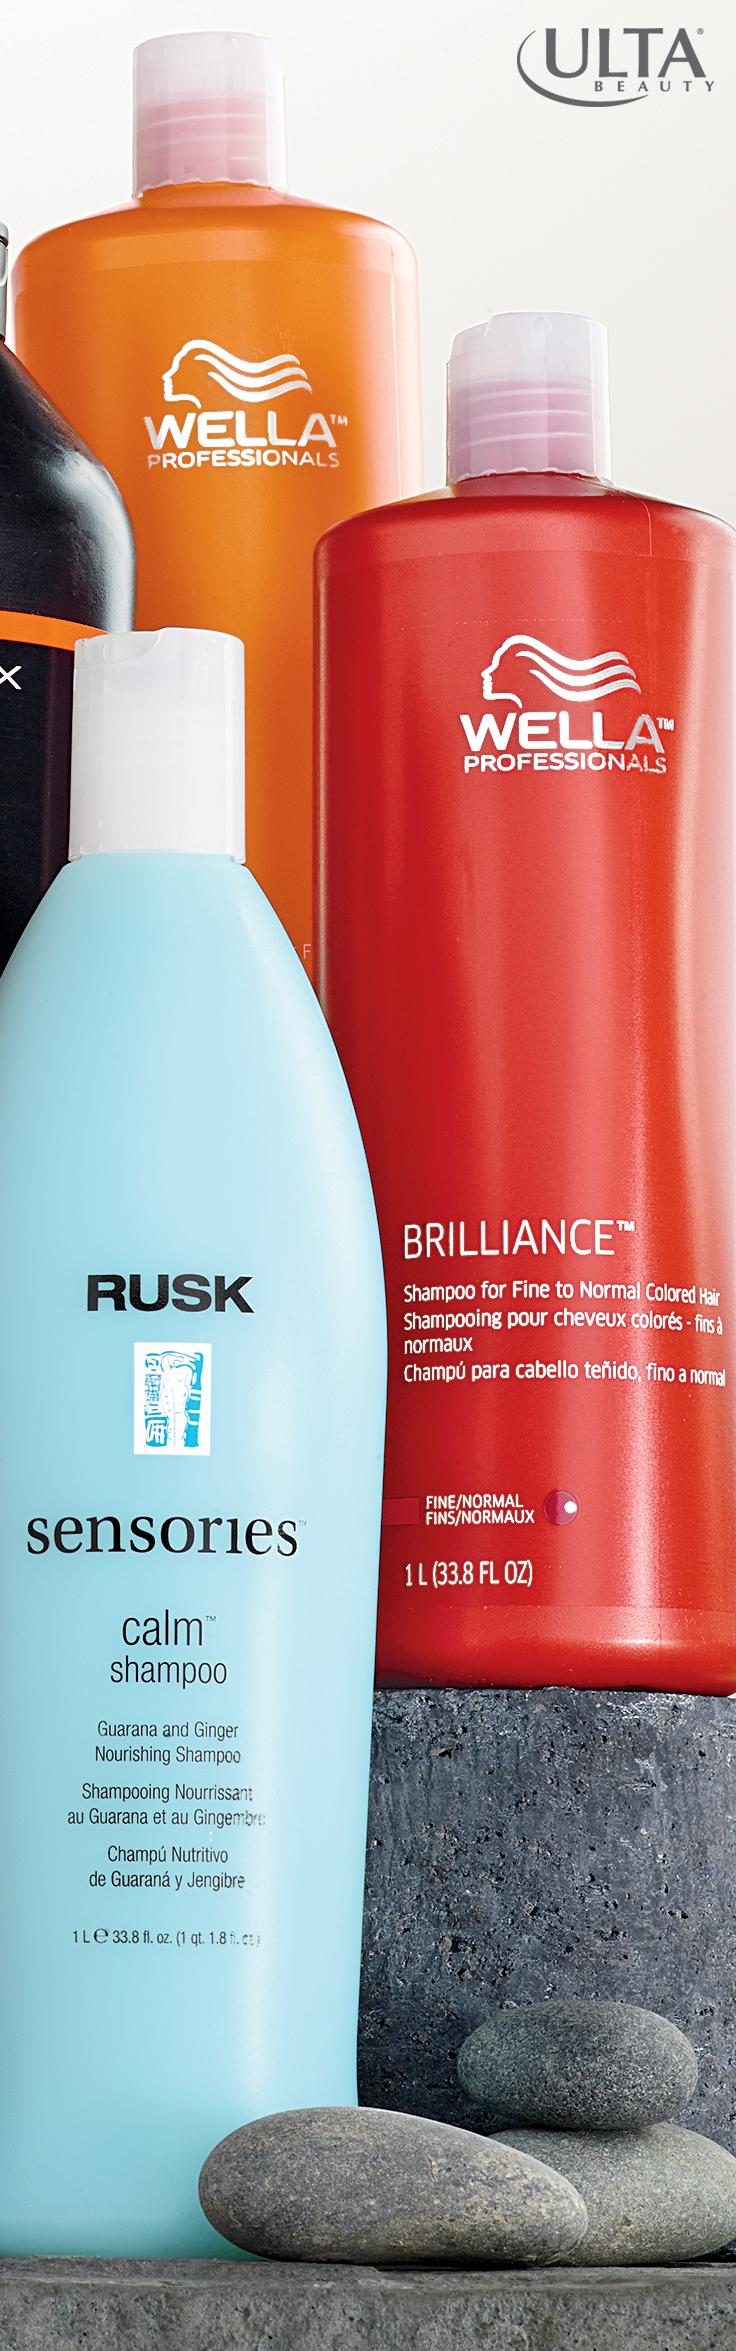 Shampoo Ulta Beauty Favorite shampoo, Ulta, Ulta beauty